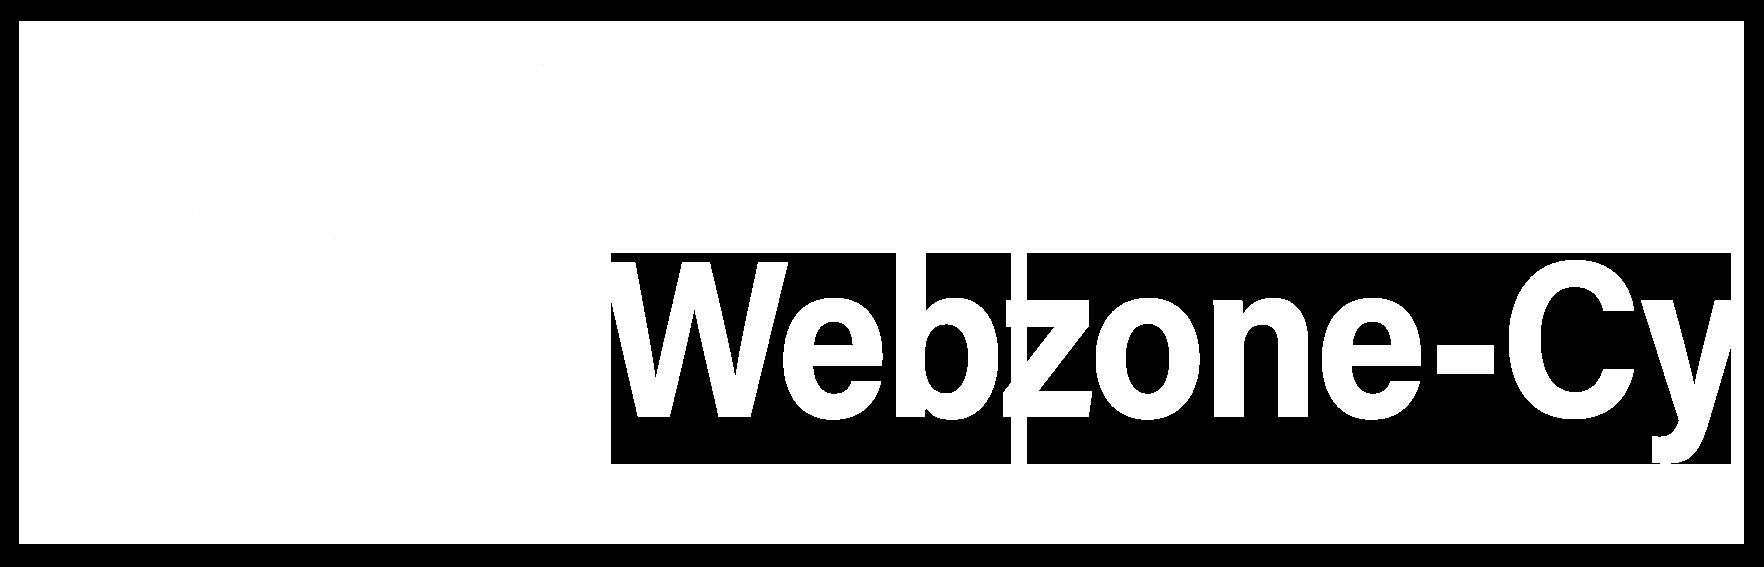 Webzone Cyprus logo